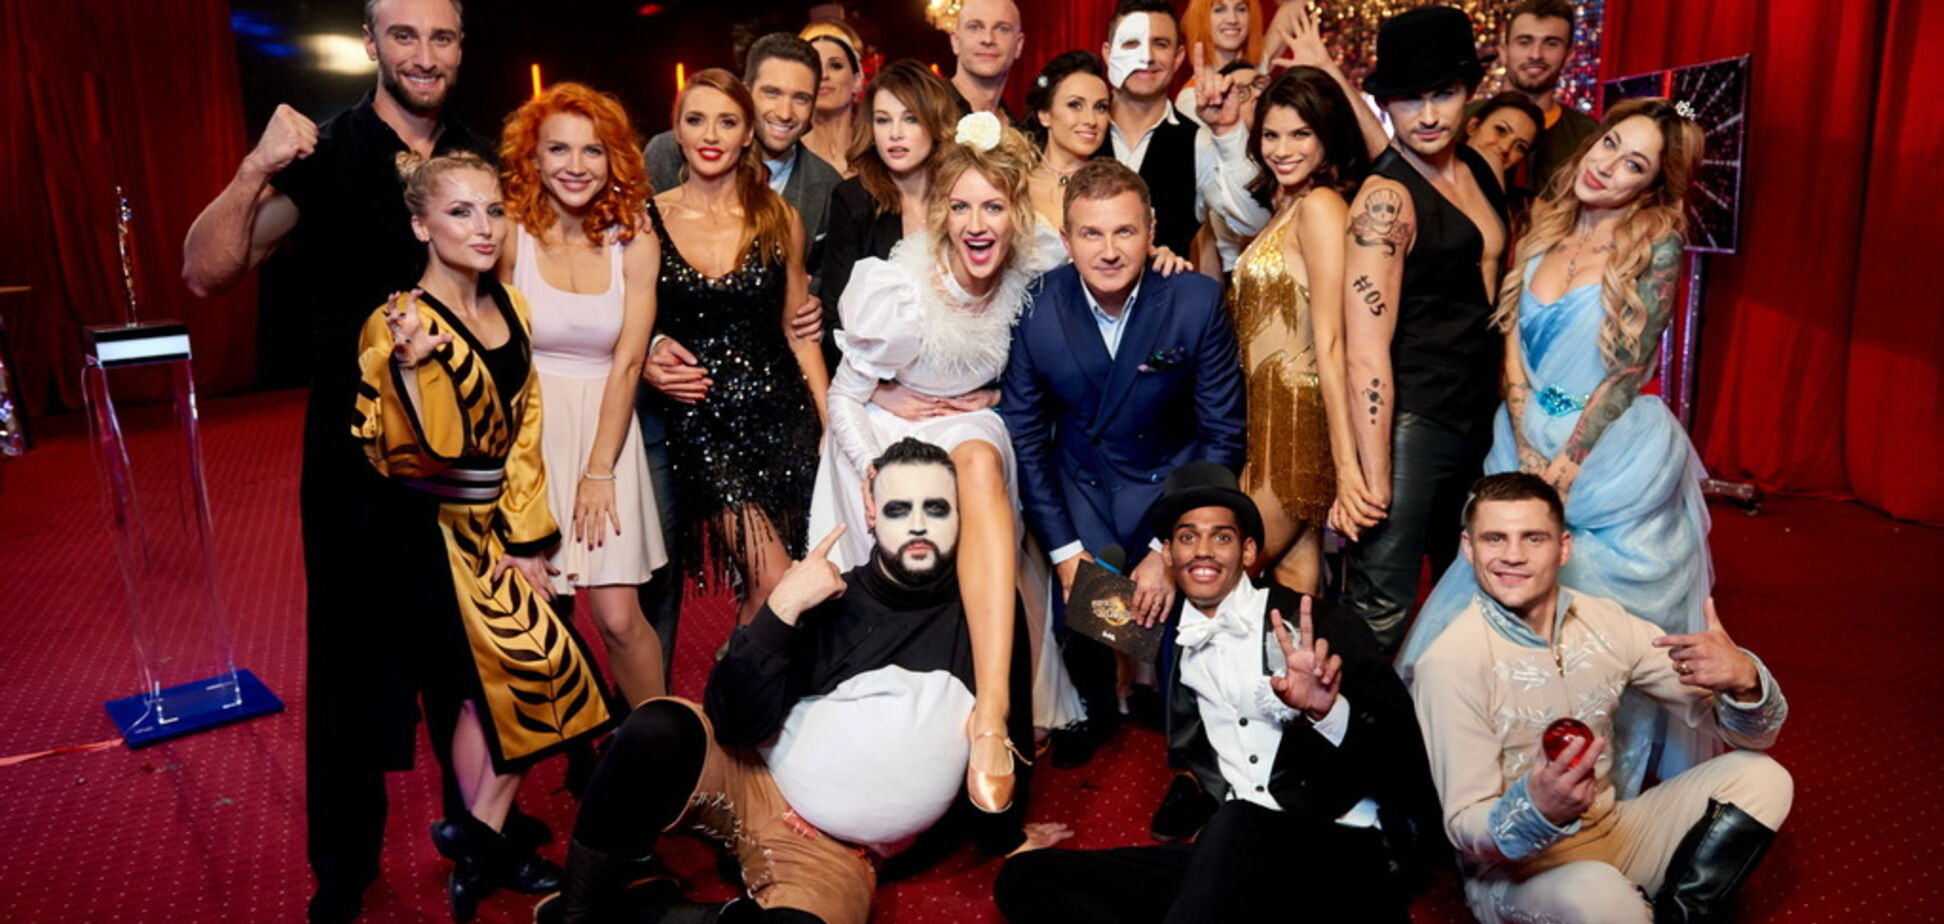 'Танці з зірками': знаменитый певец станет специальным гостем пятого выпуска